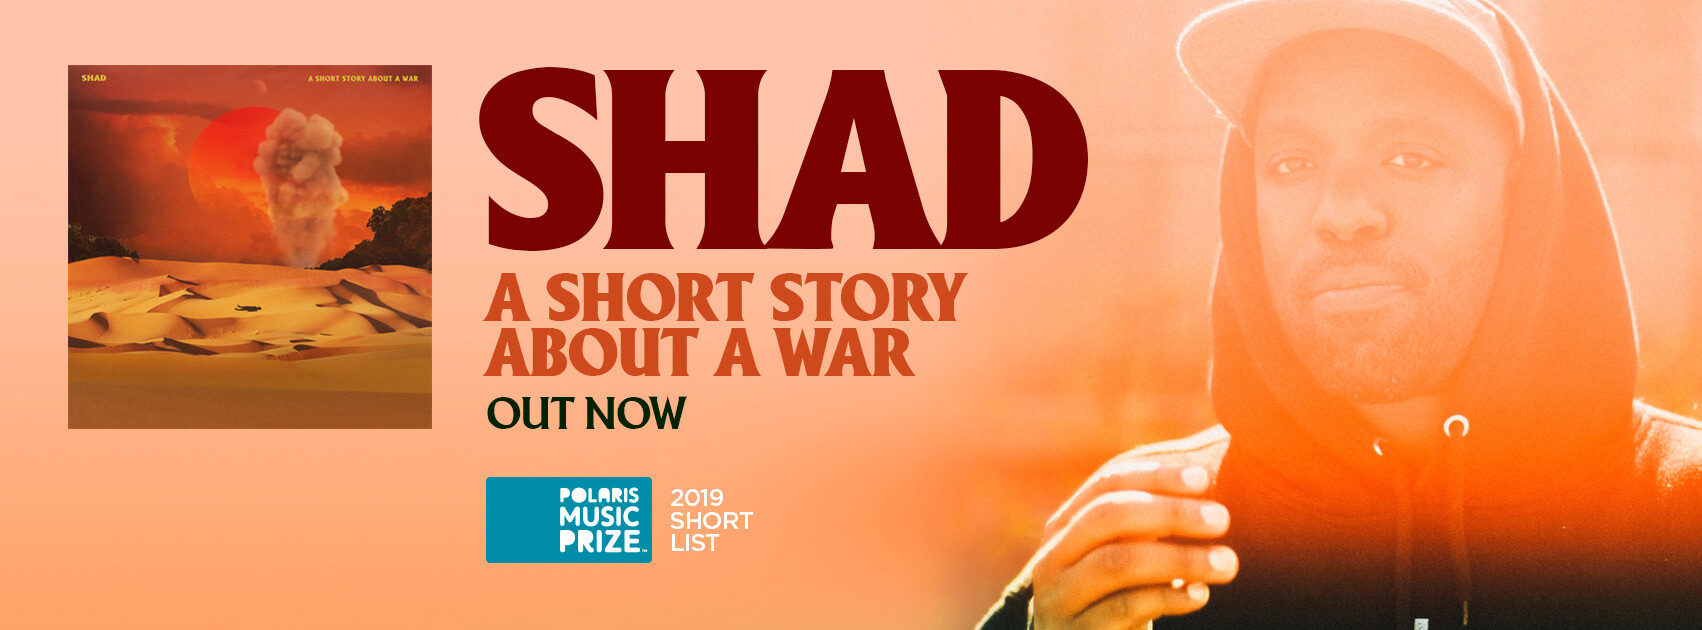 Shad-SiteSCR-En